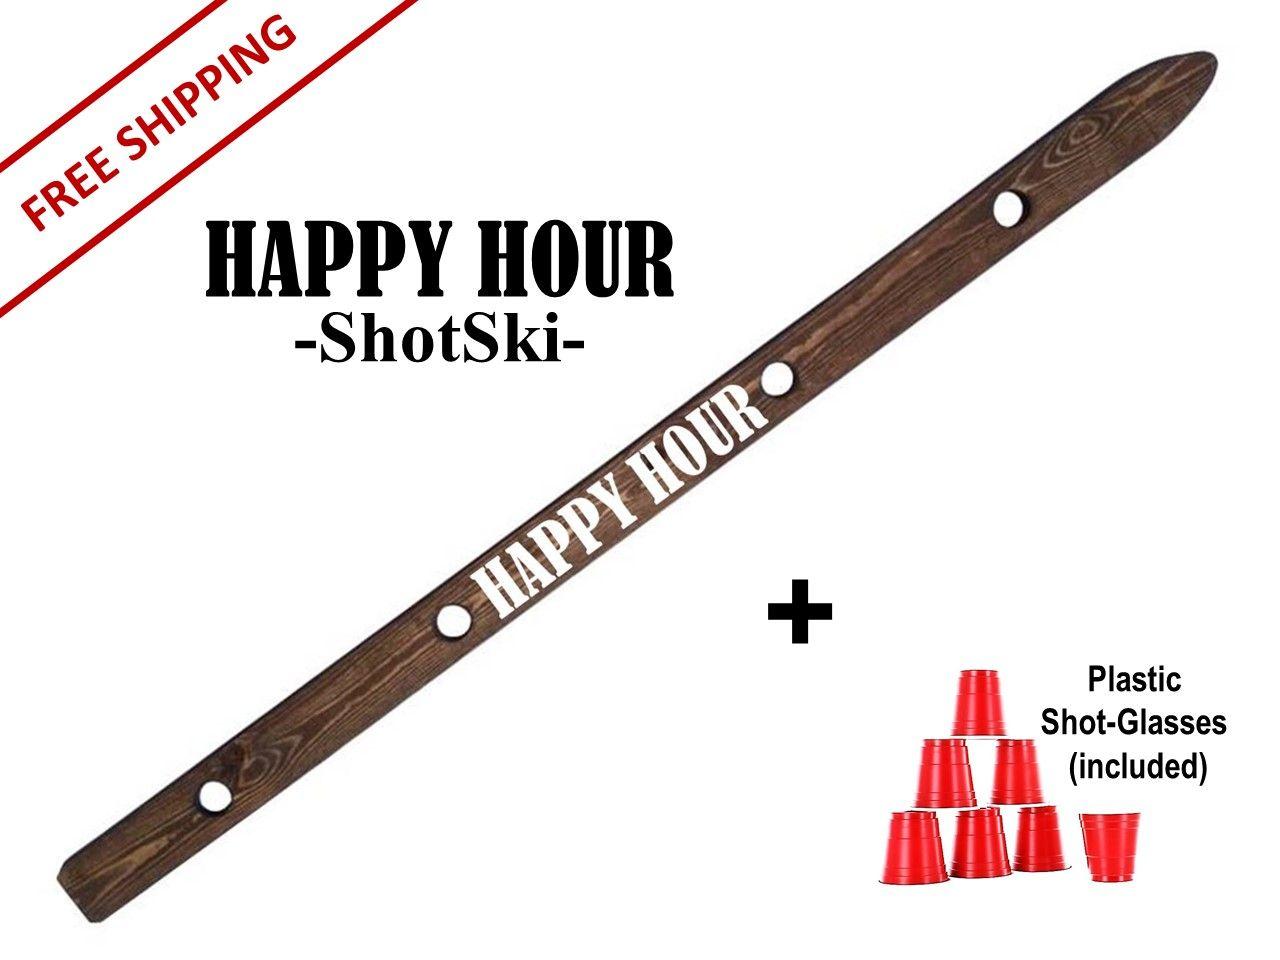 ShotSki 50 +FREE SHIPPING shotski happyhour skishot